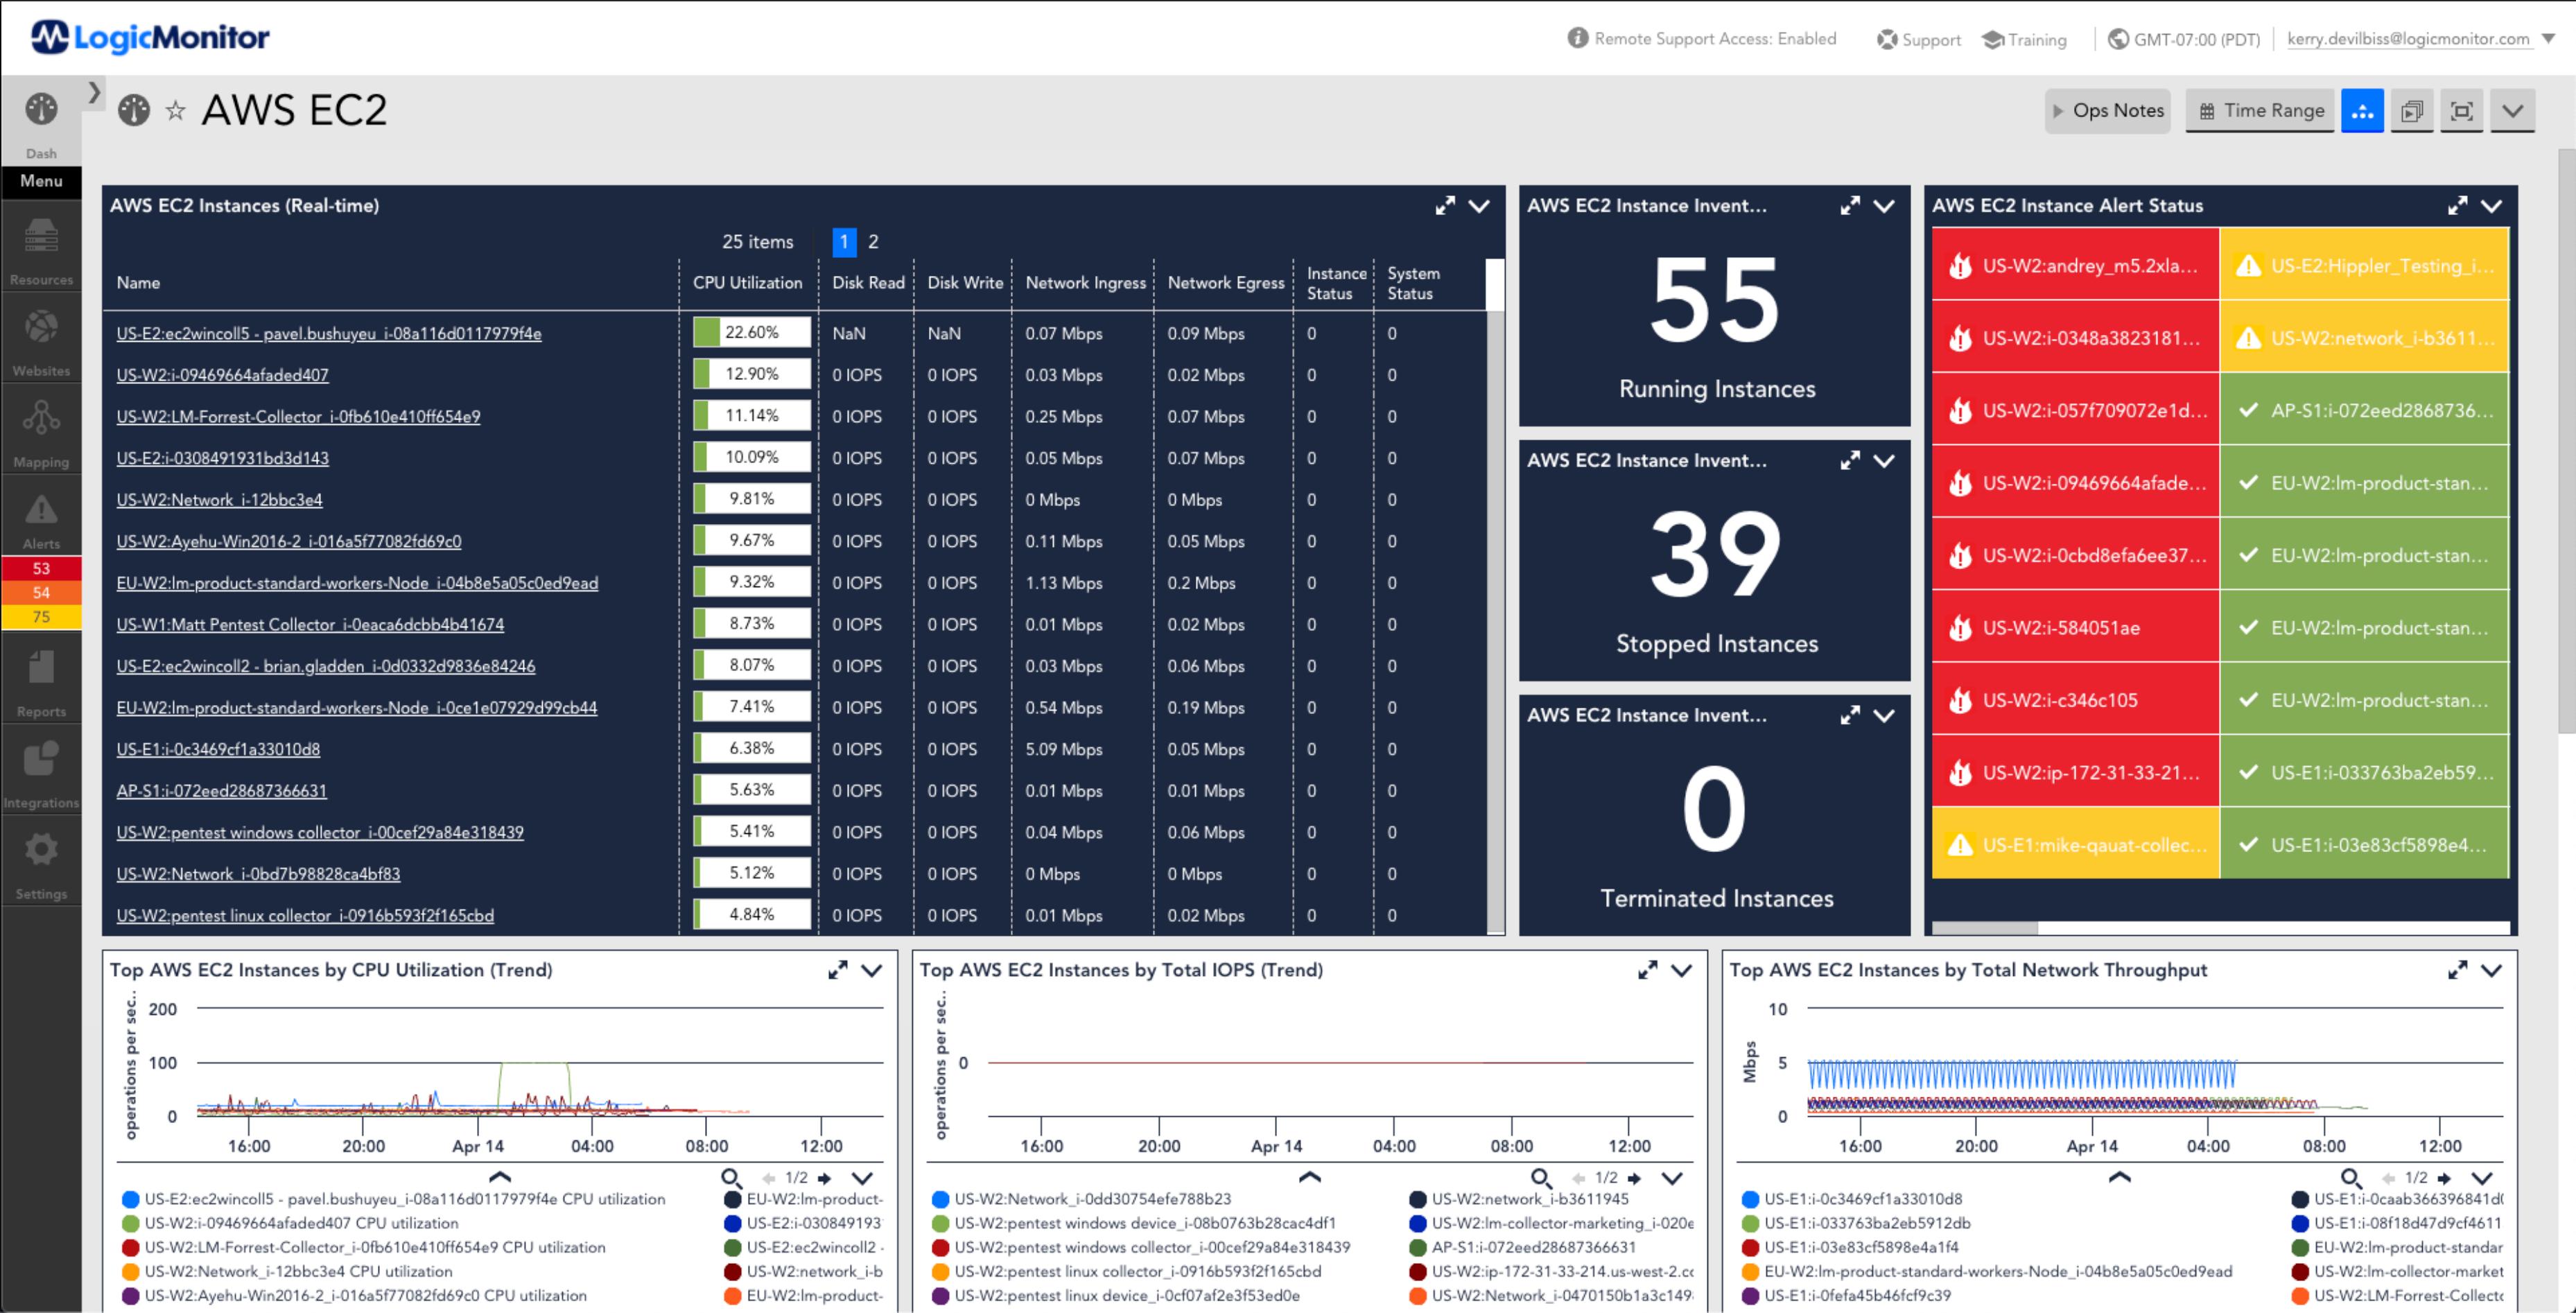 LogicMonitor Software - AWS EC2 Monitoring Dashboard